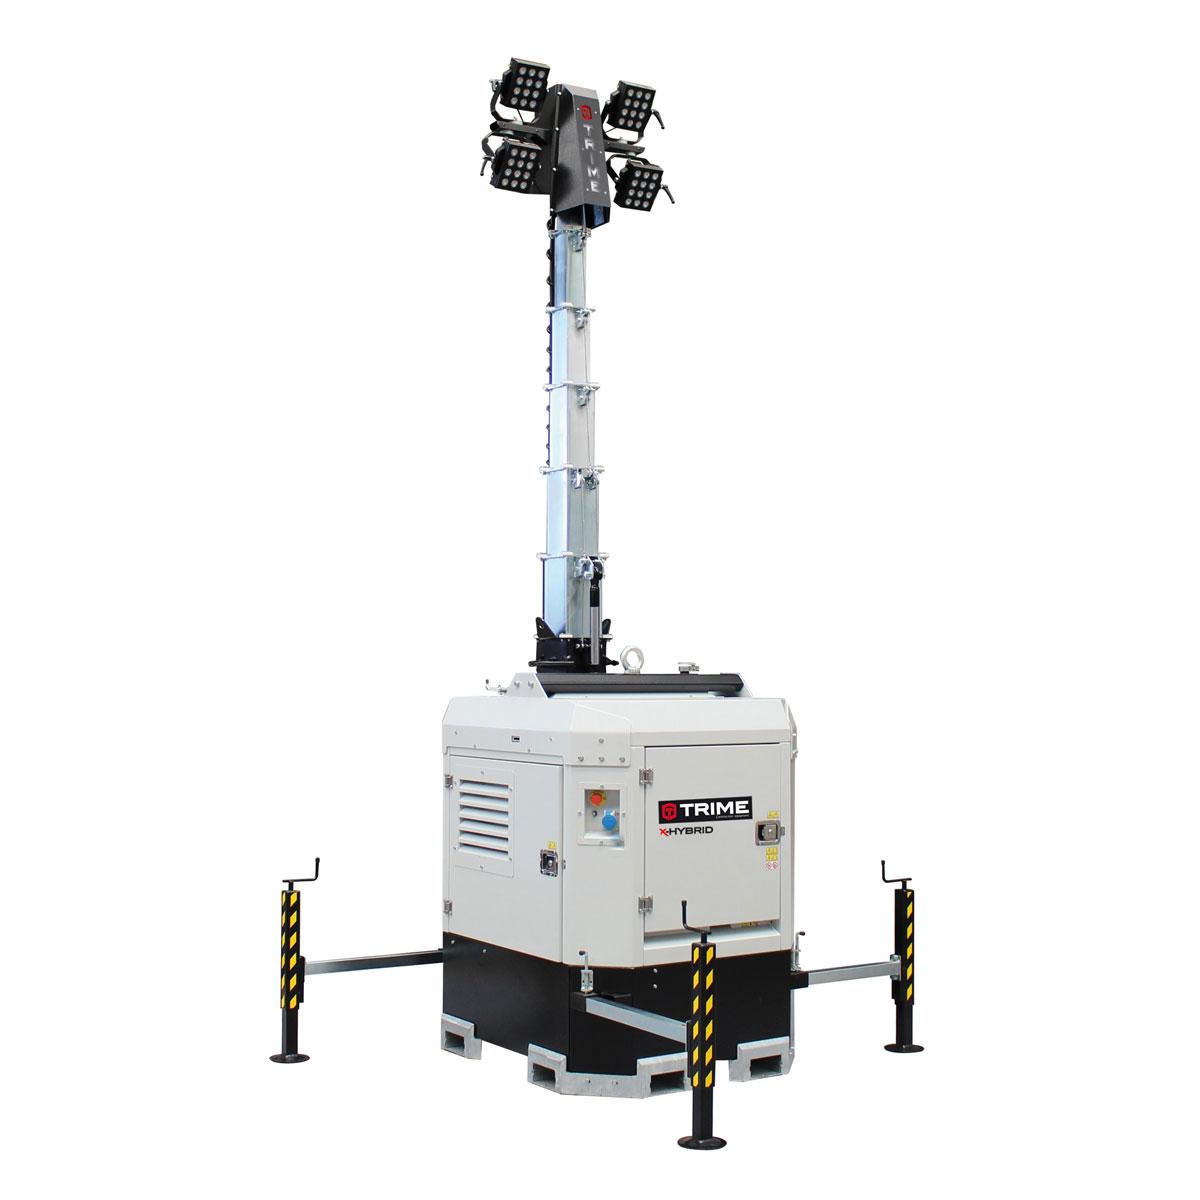 belysningsmast-led-x-hybrid-4x90W